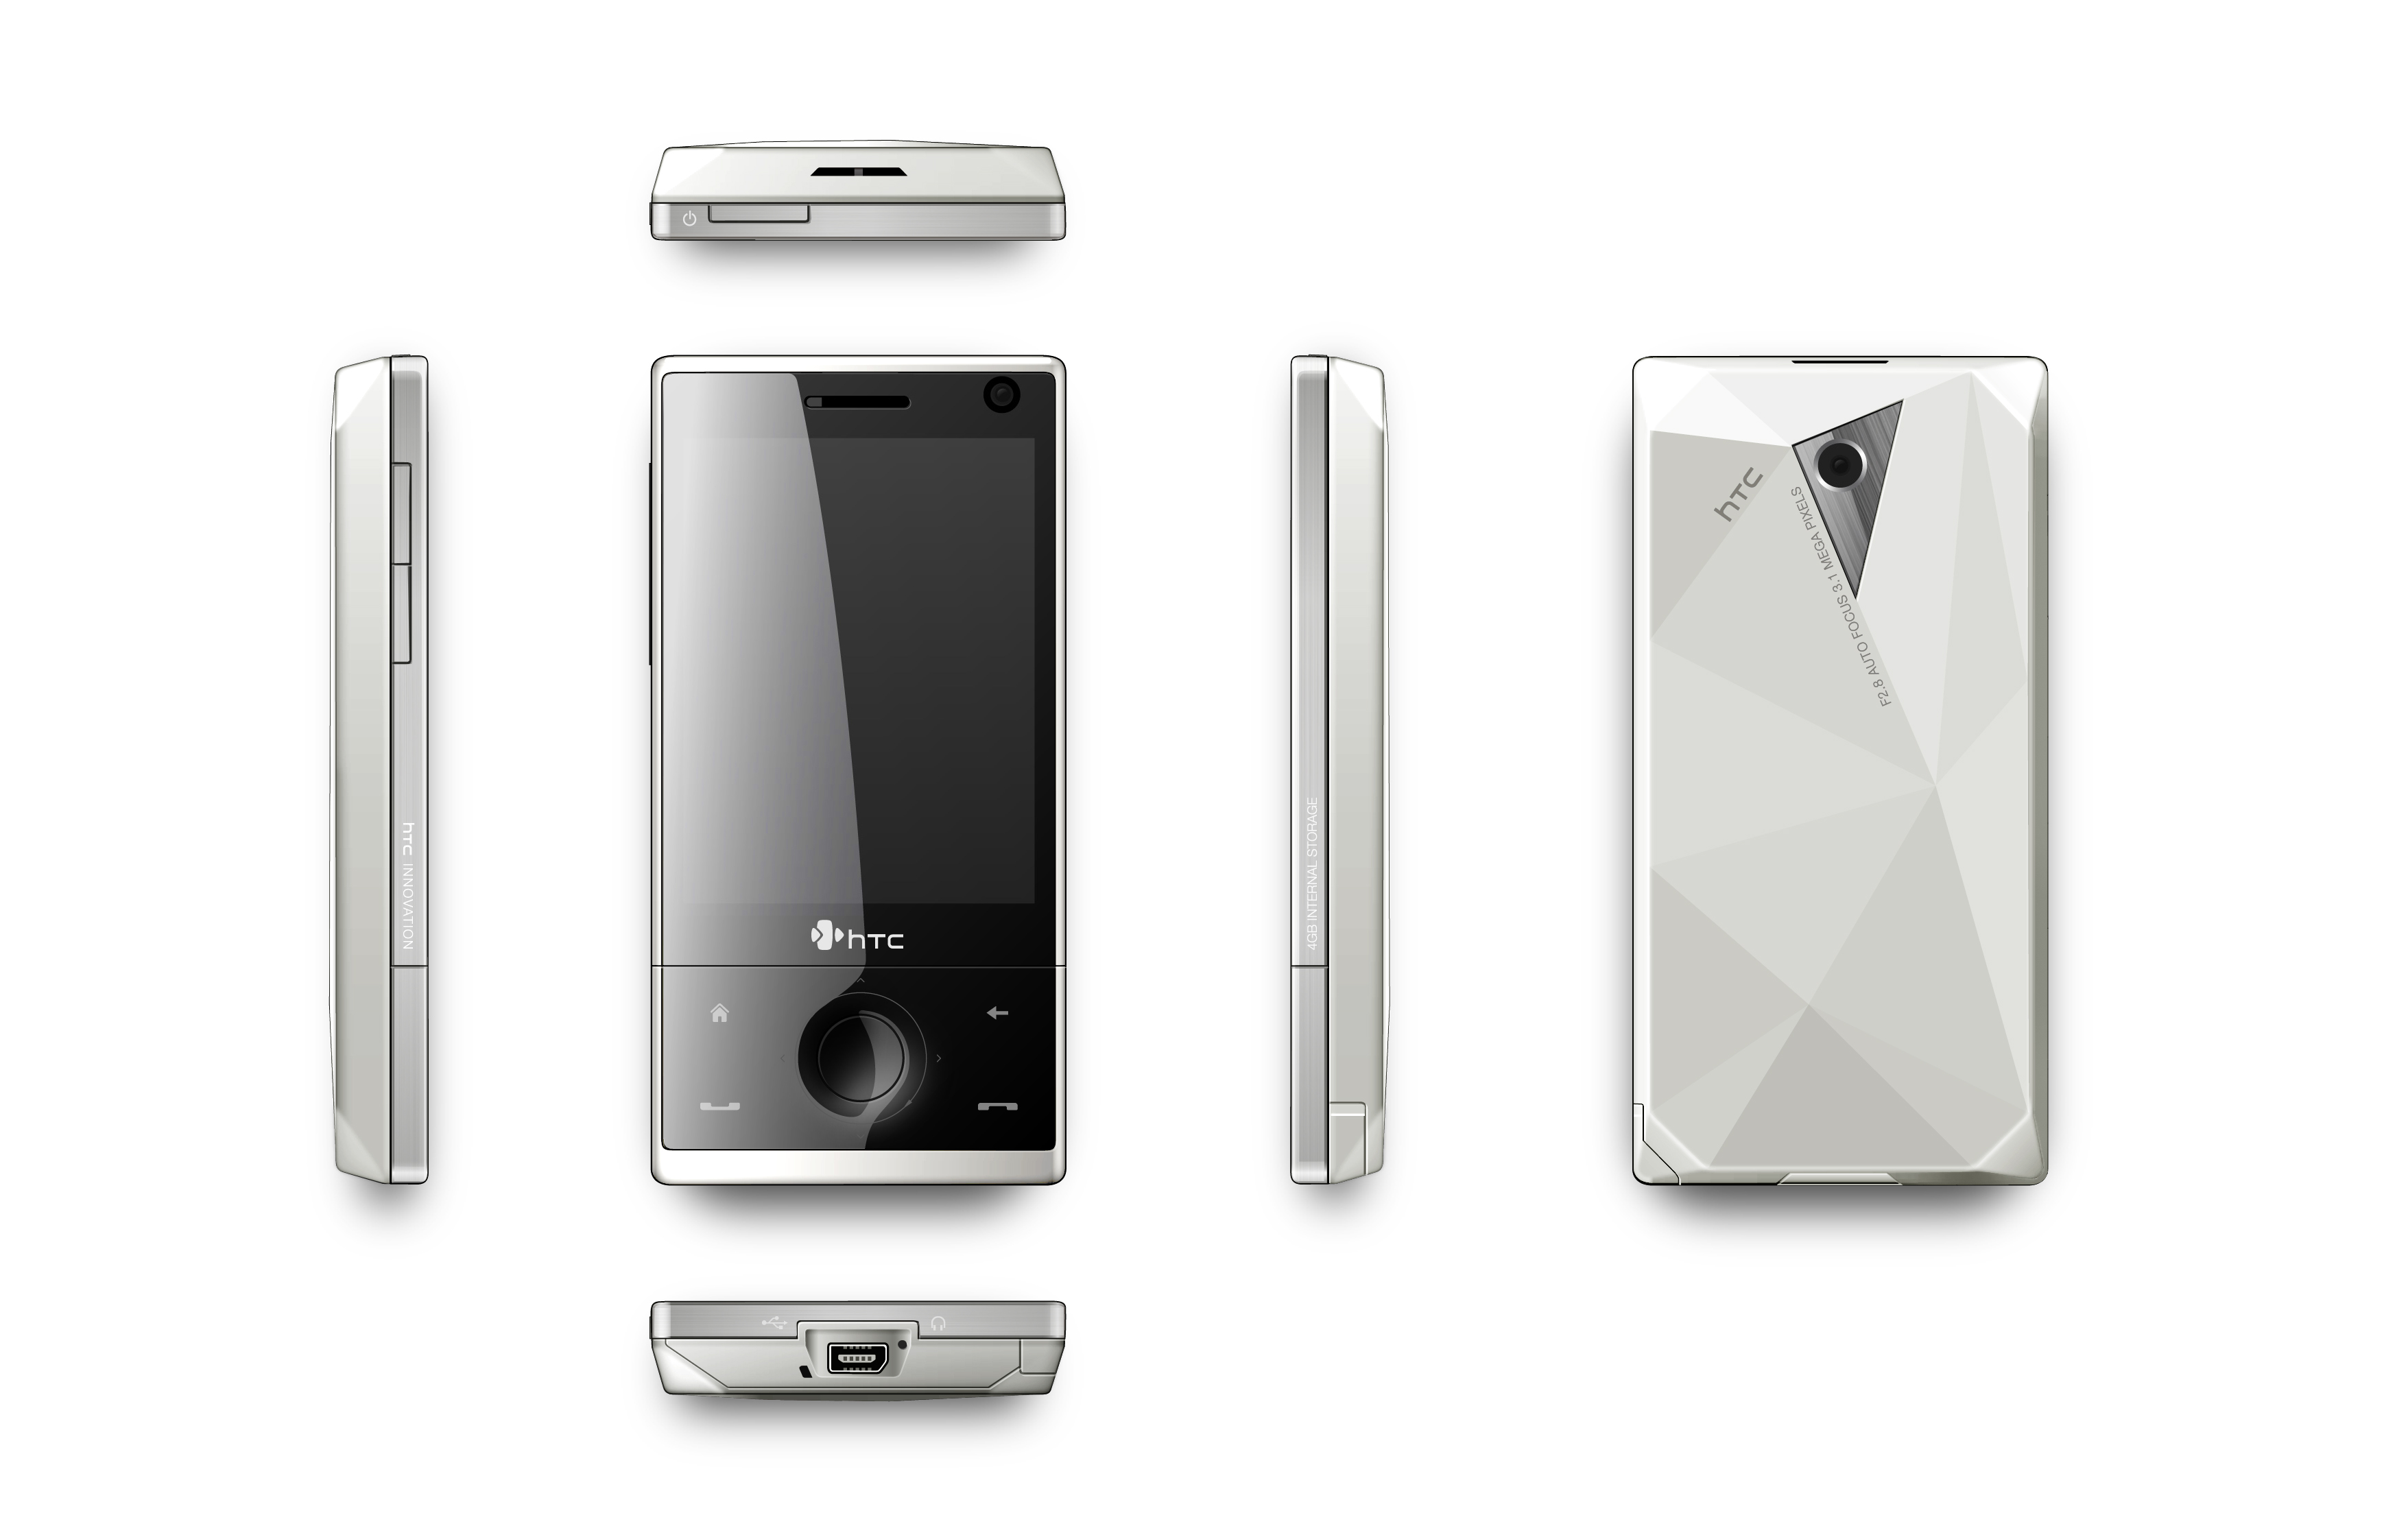 http://pdadb.net/img/gallery/big/htc_touch_diamond_white_6_view.jpg